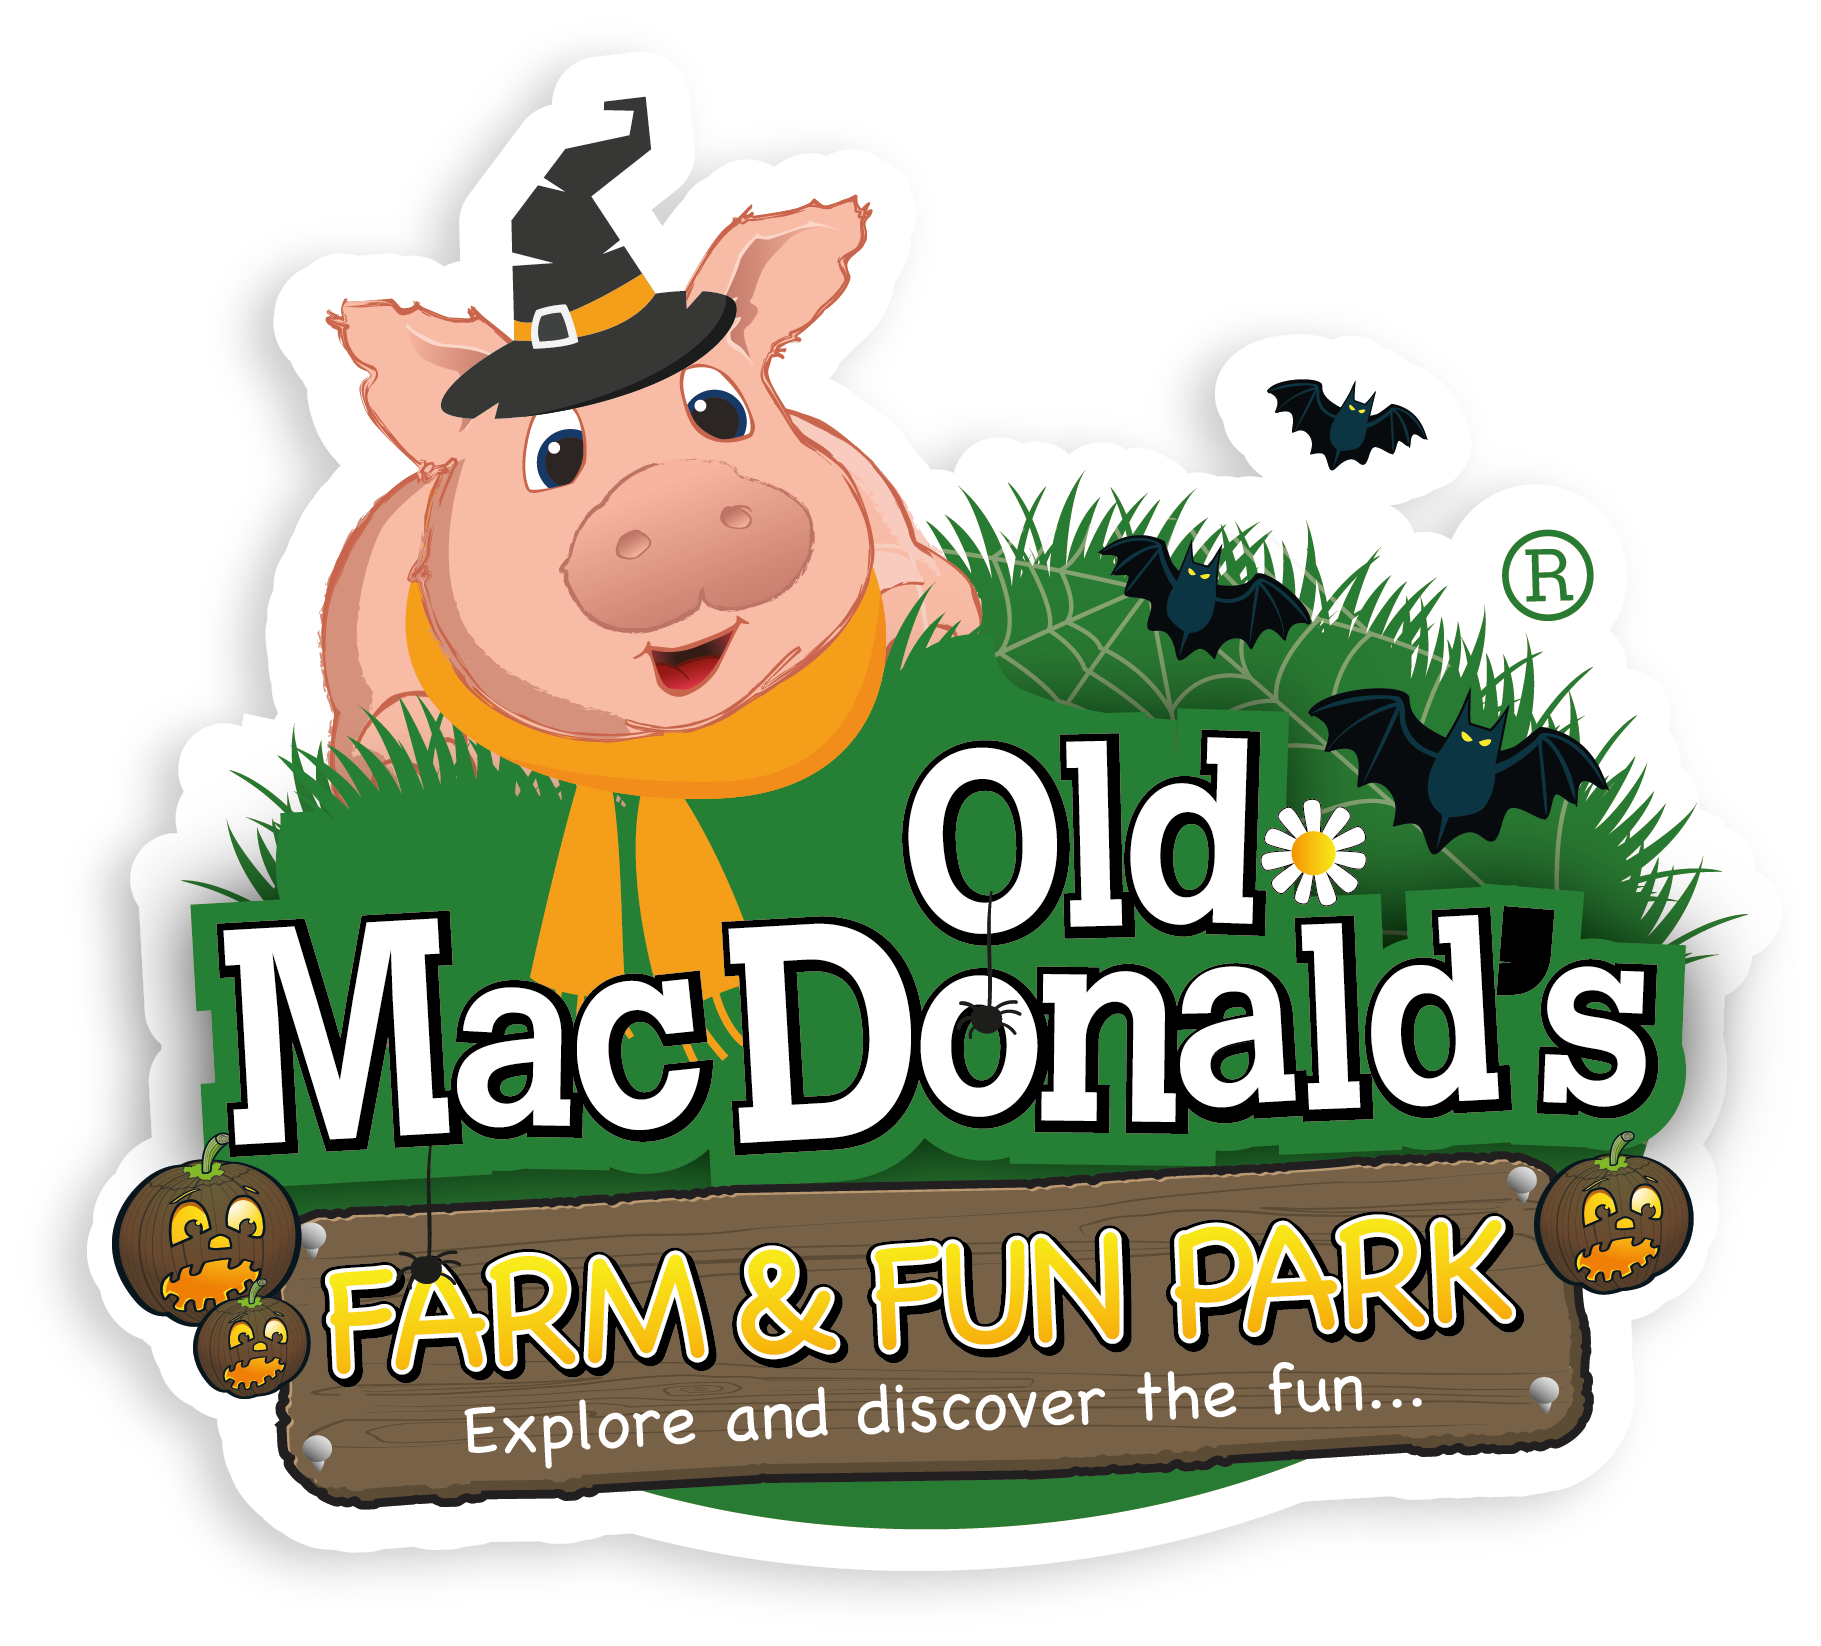 Old McDonalds Farm